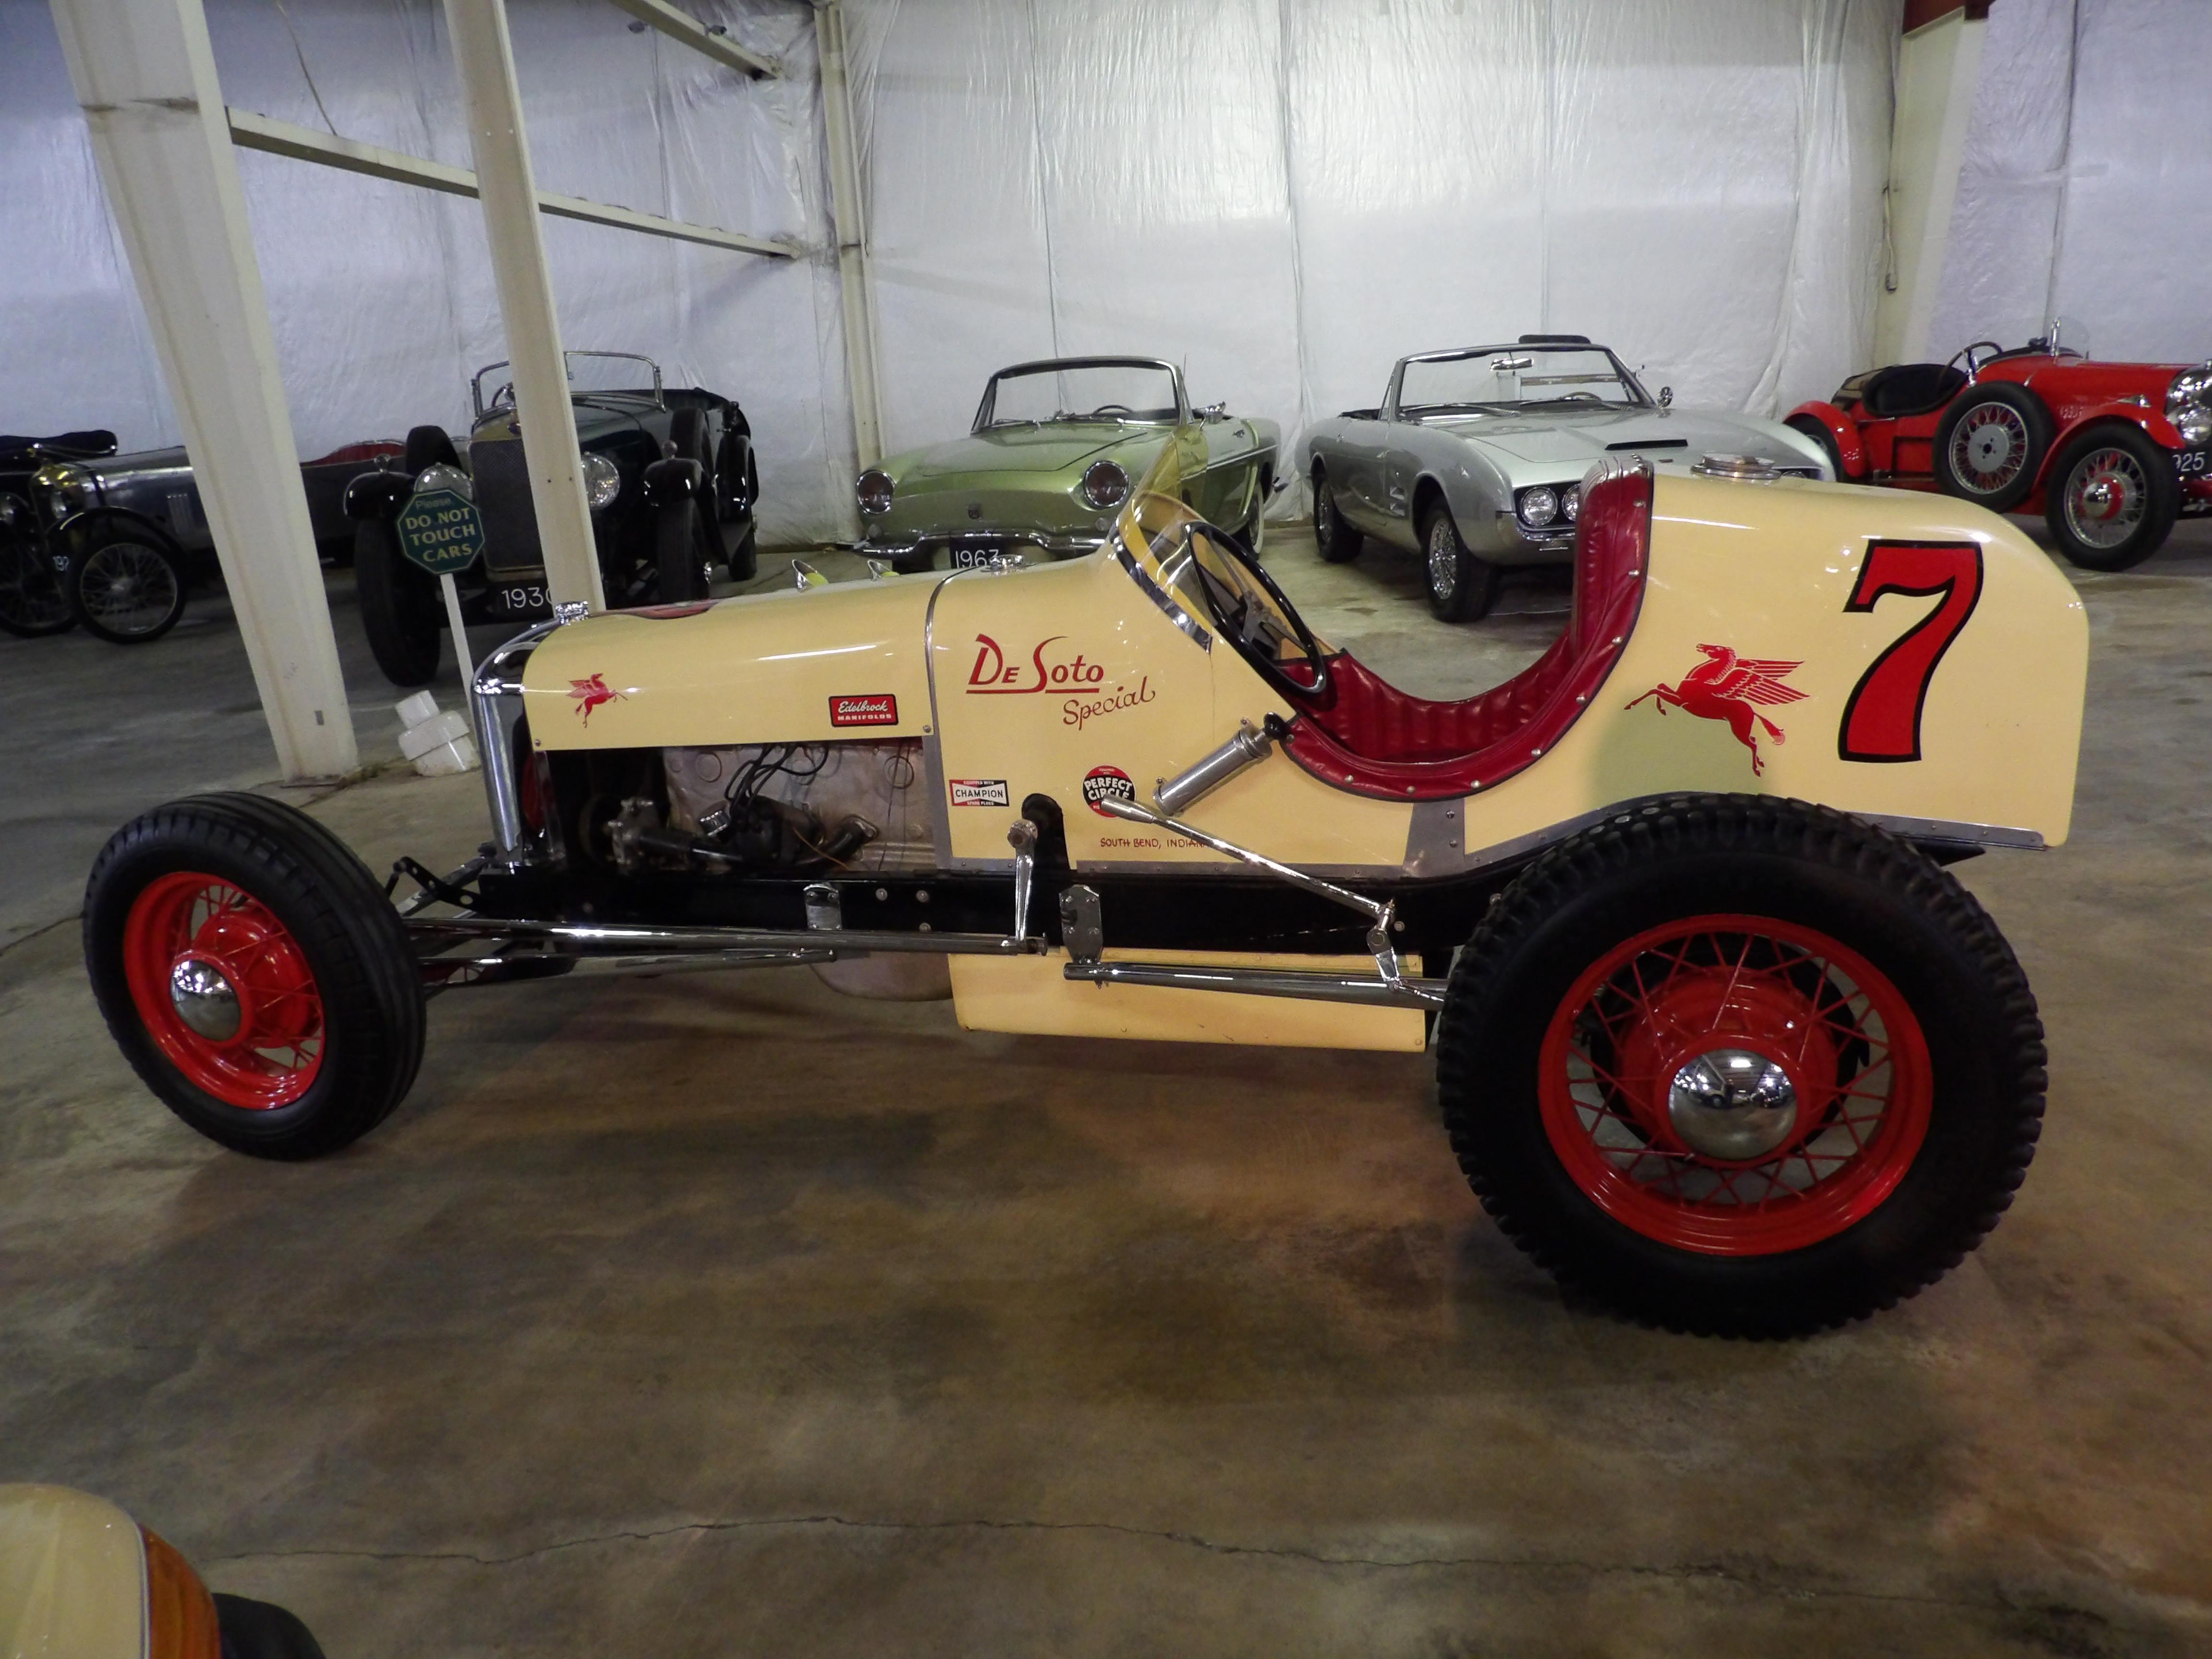 1928 DeSoto Indianapolis Style Race Car Cars For Sale Antique